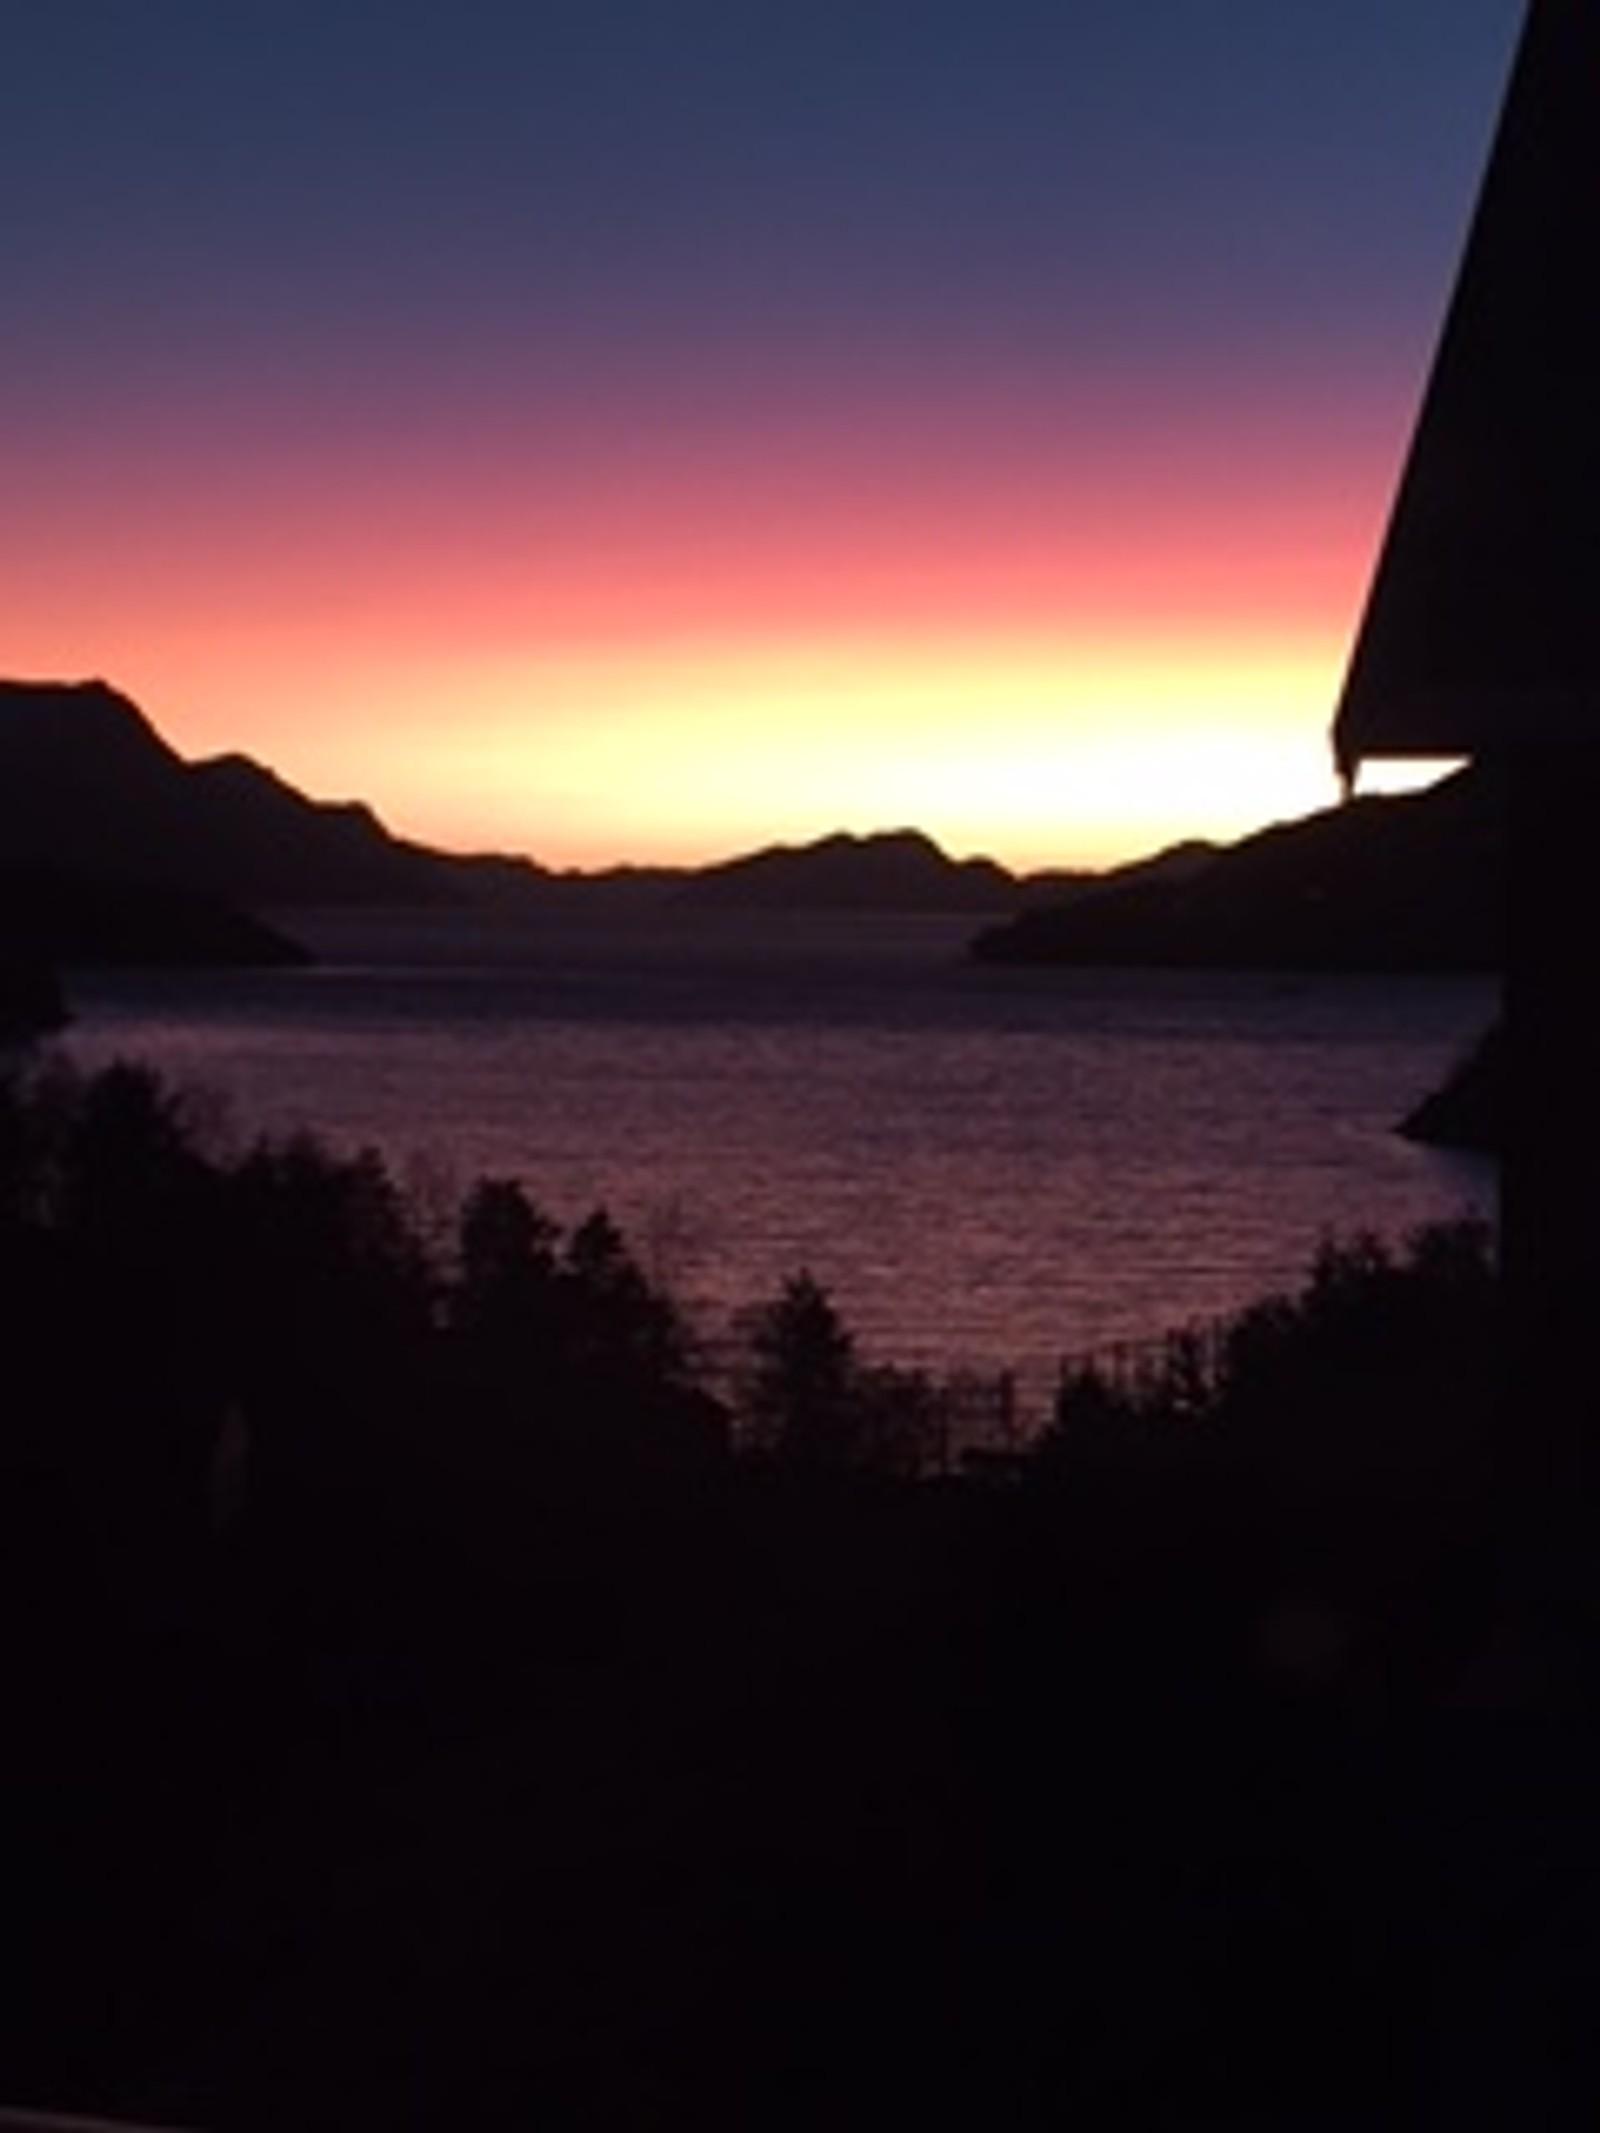 Solnedgang over Eikenosvågen, Ålesund.